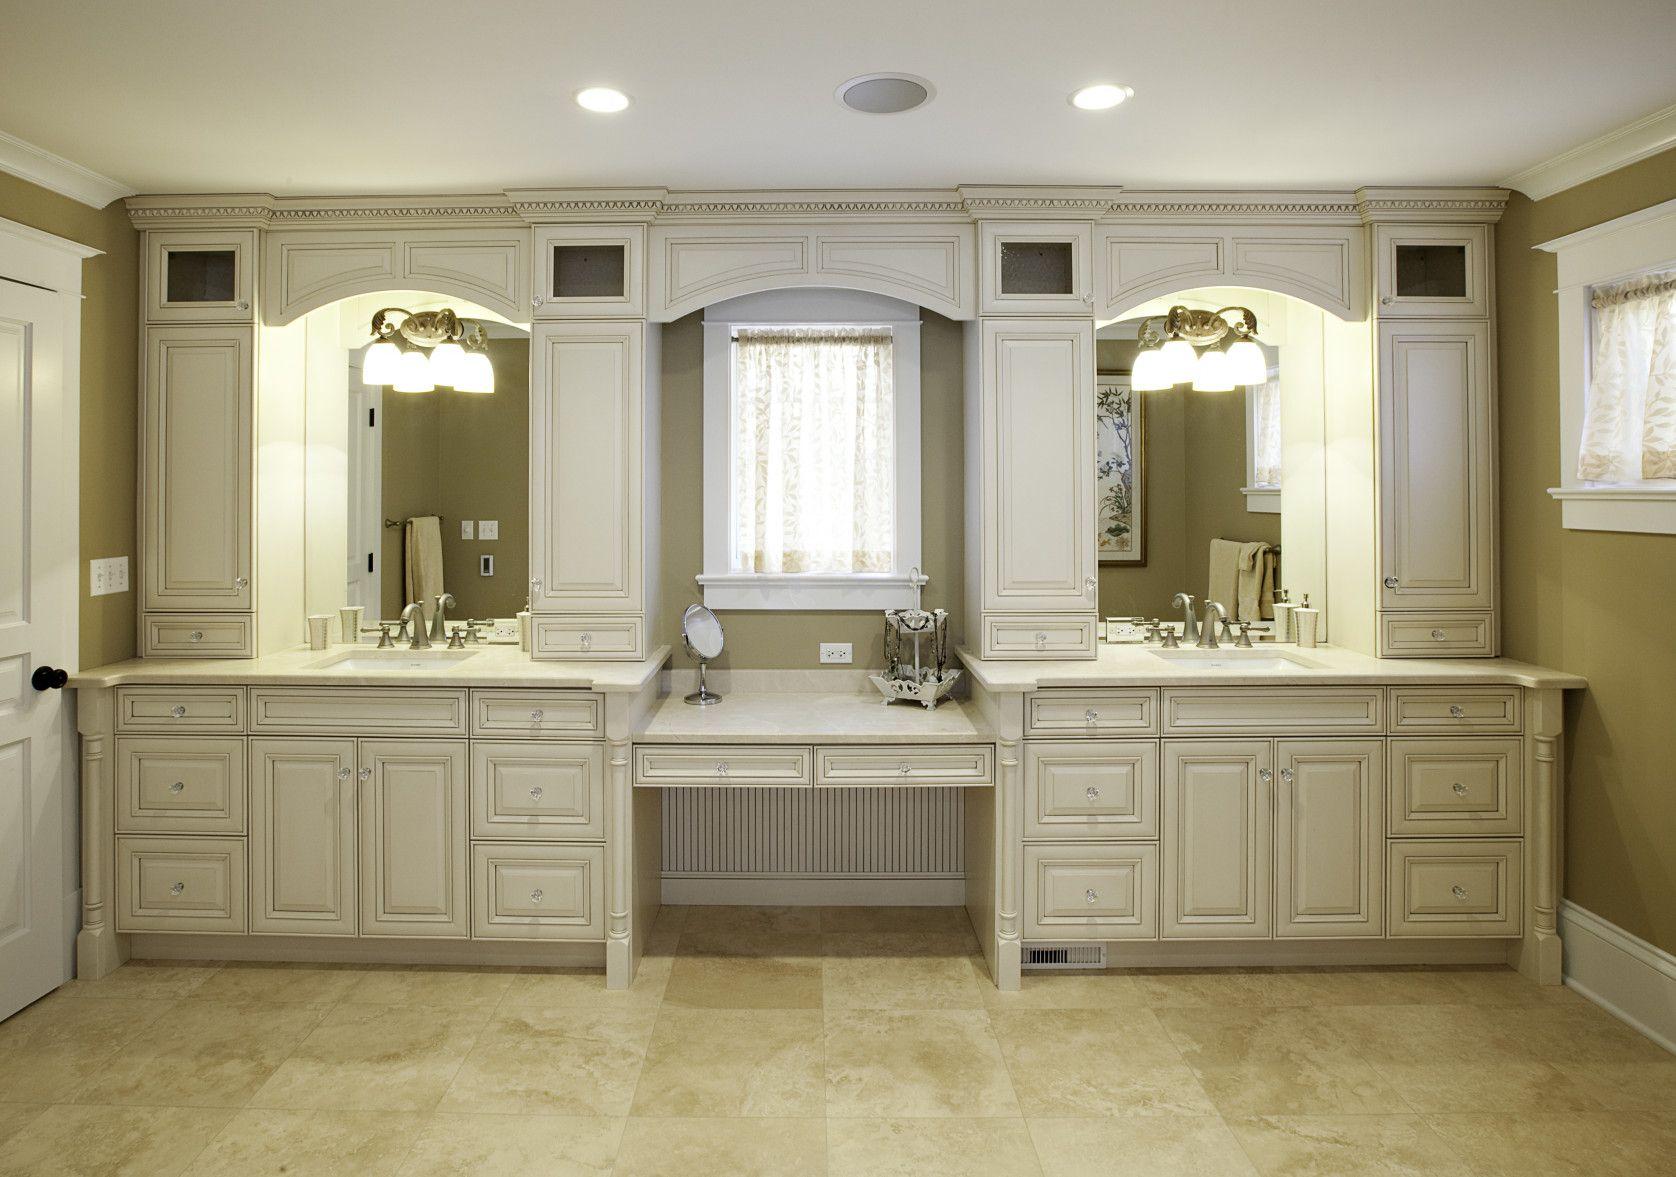 Pin by rahayu12 on interior analogi Bathroom with makeup